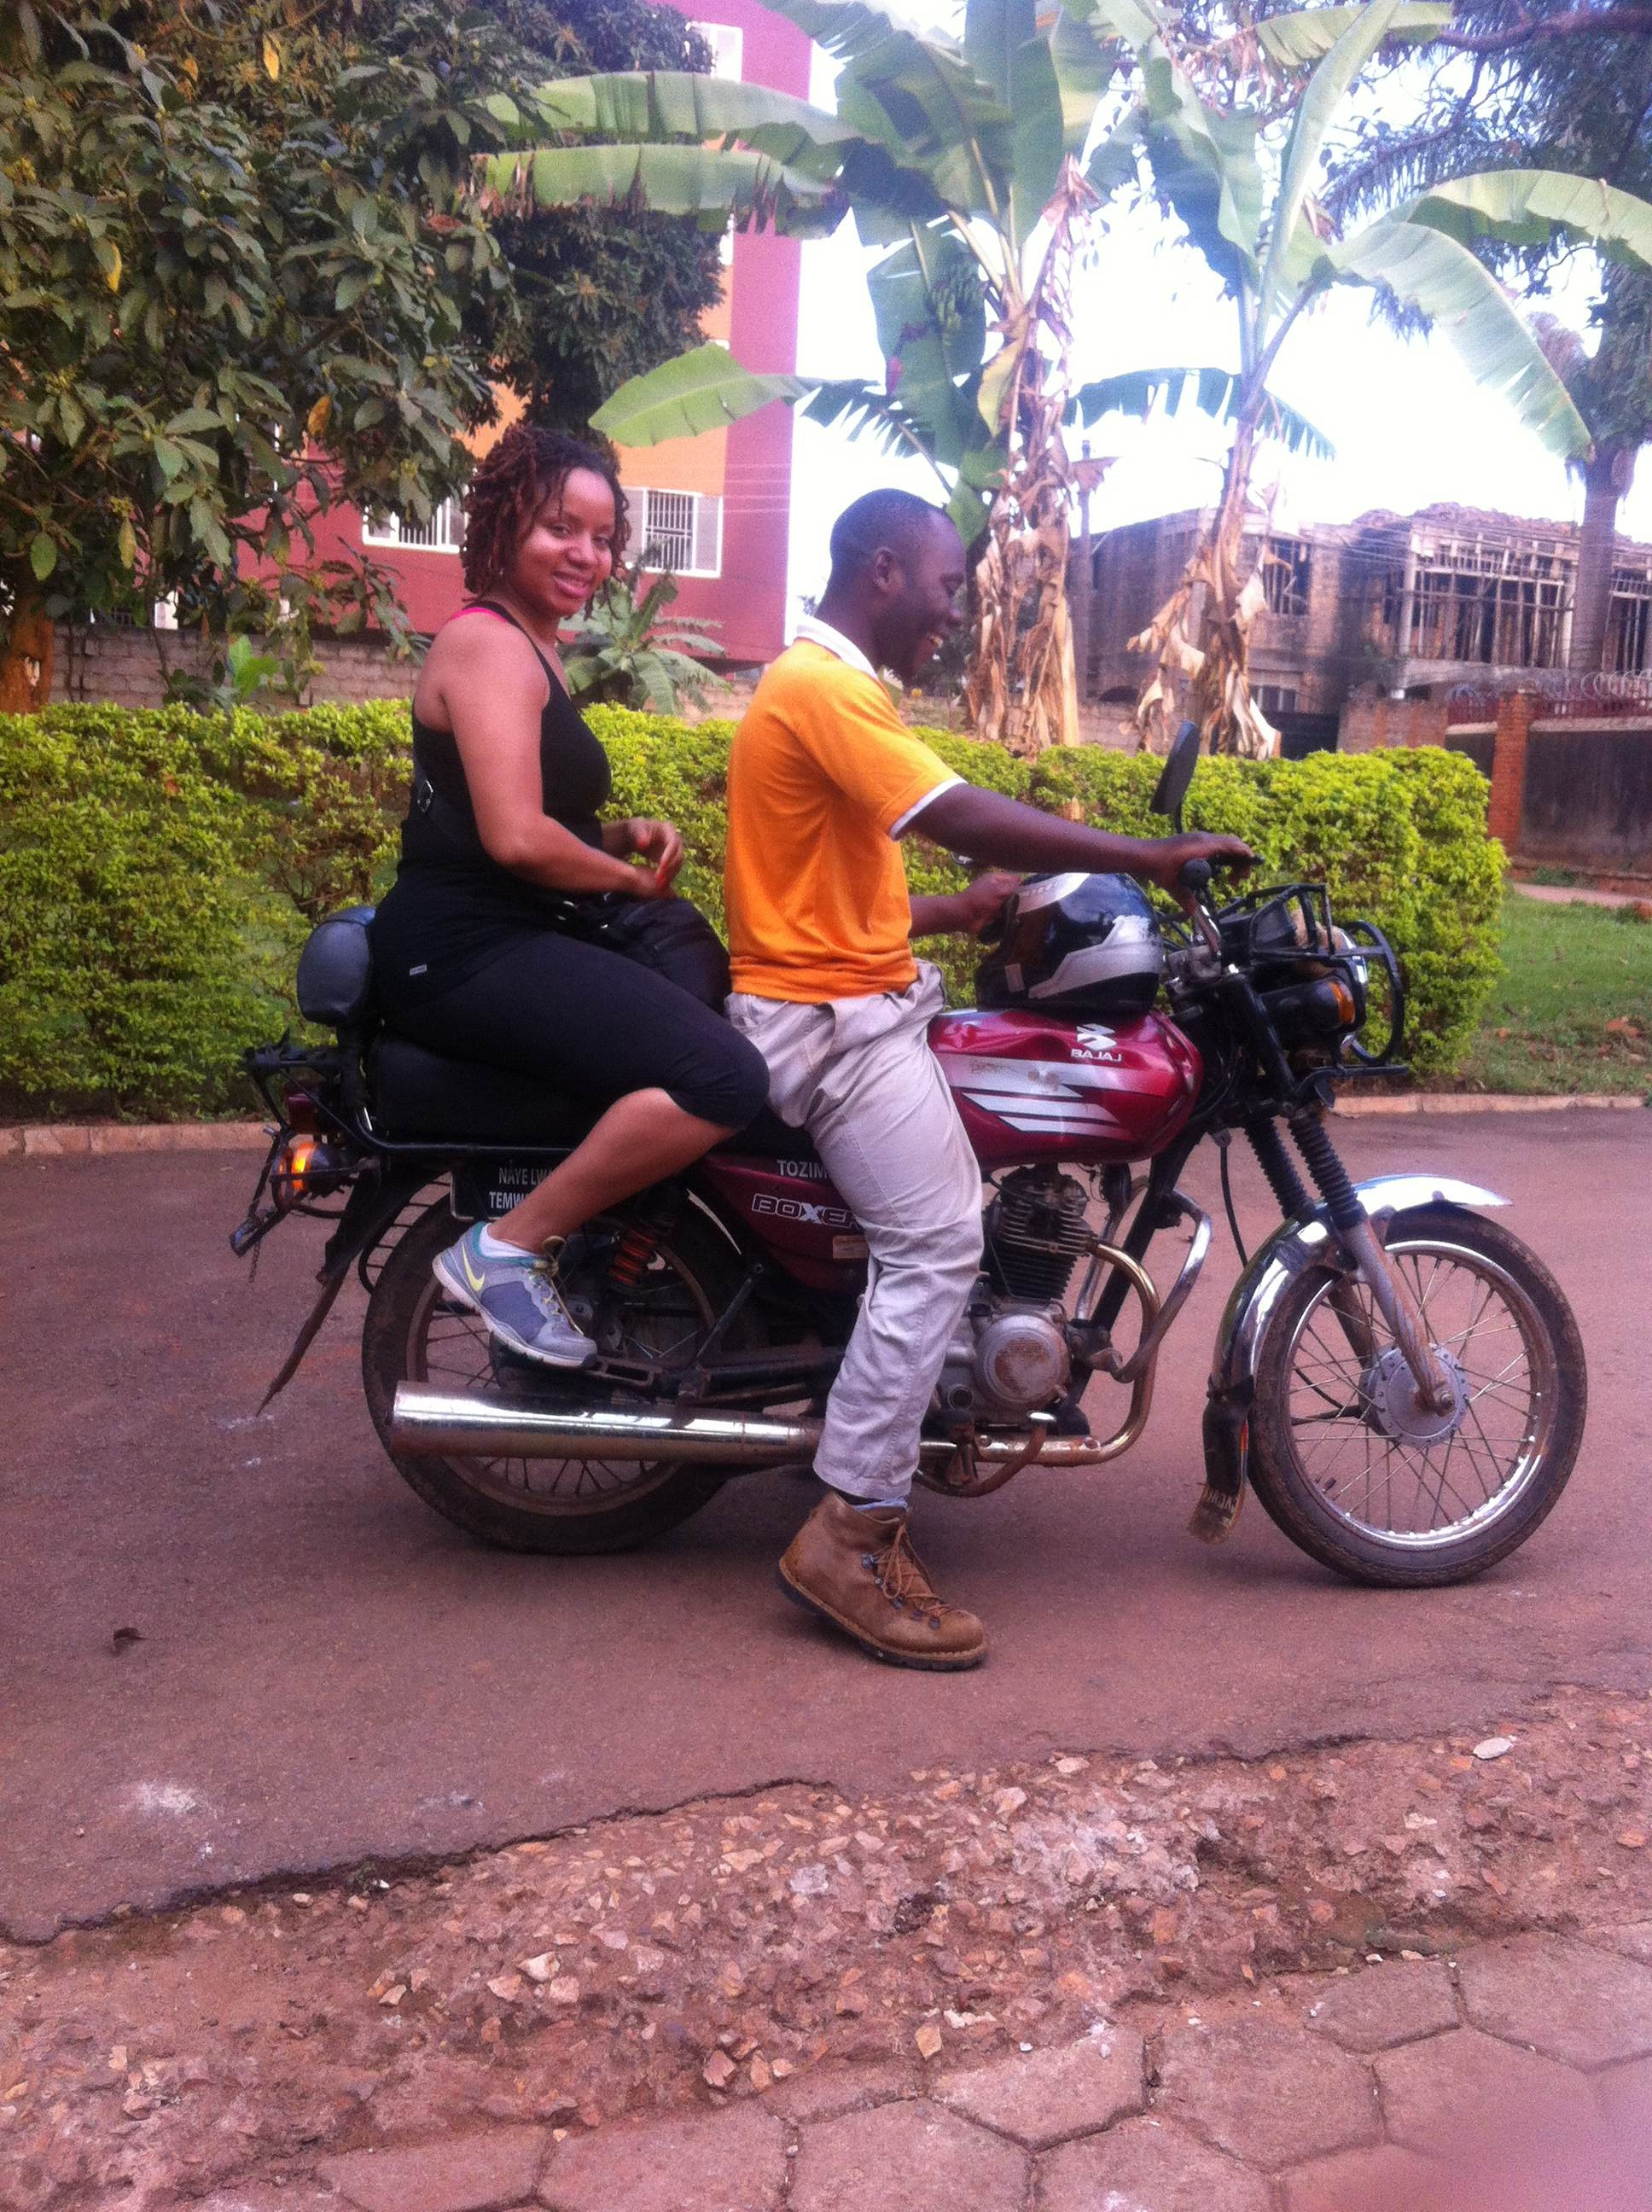 Kristen getting ready to ride on a Kampala motorbike.